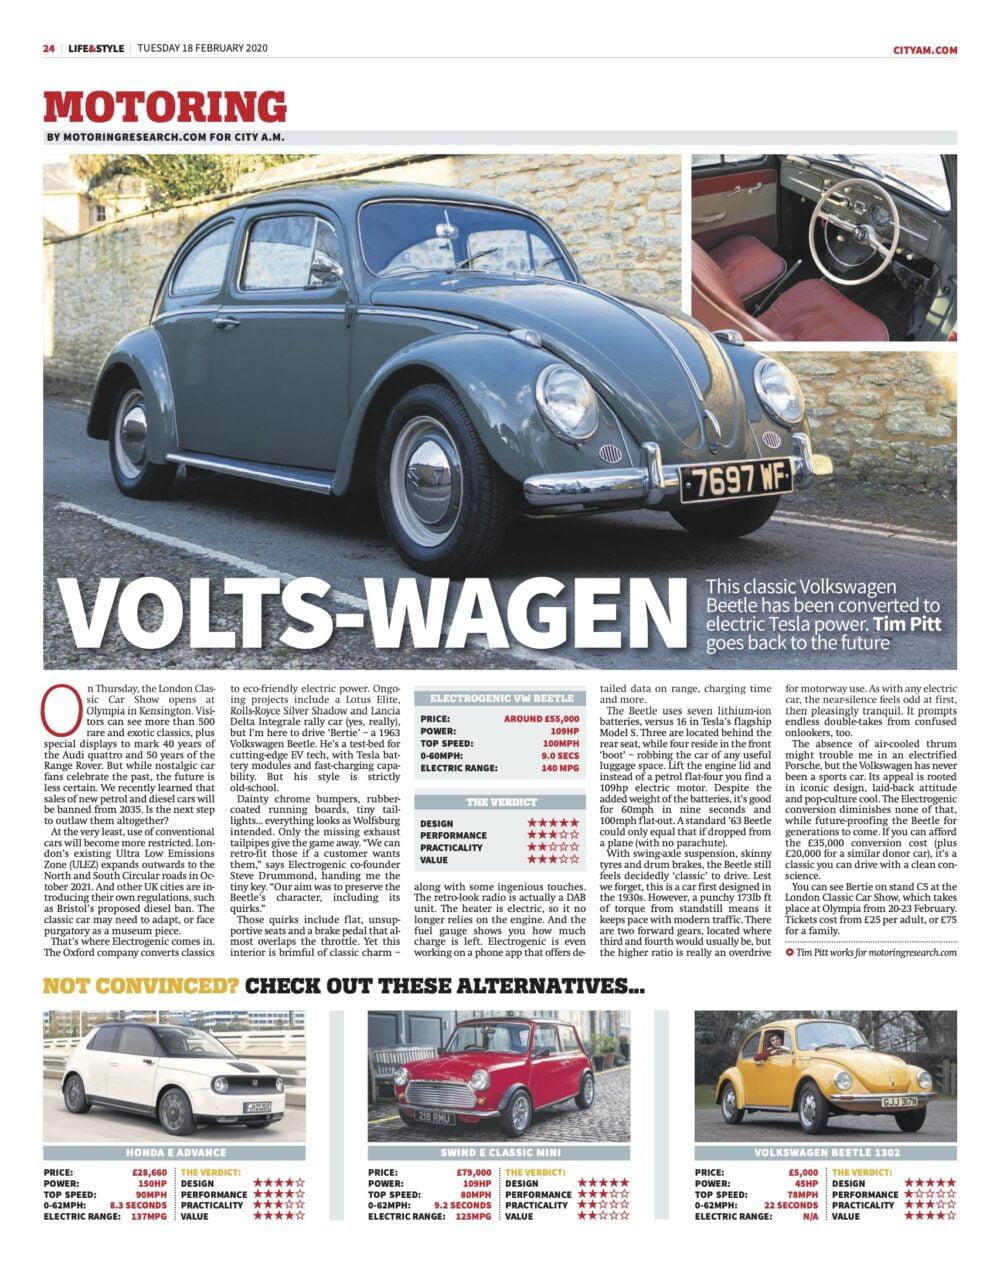 Electrogenic electric VW Beetle article